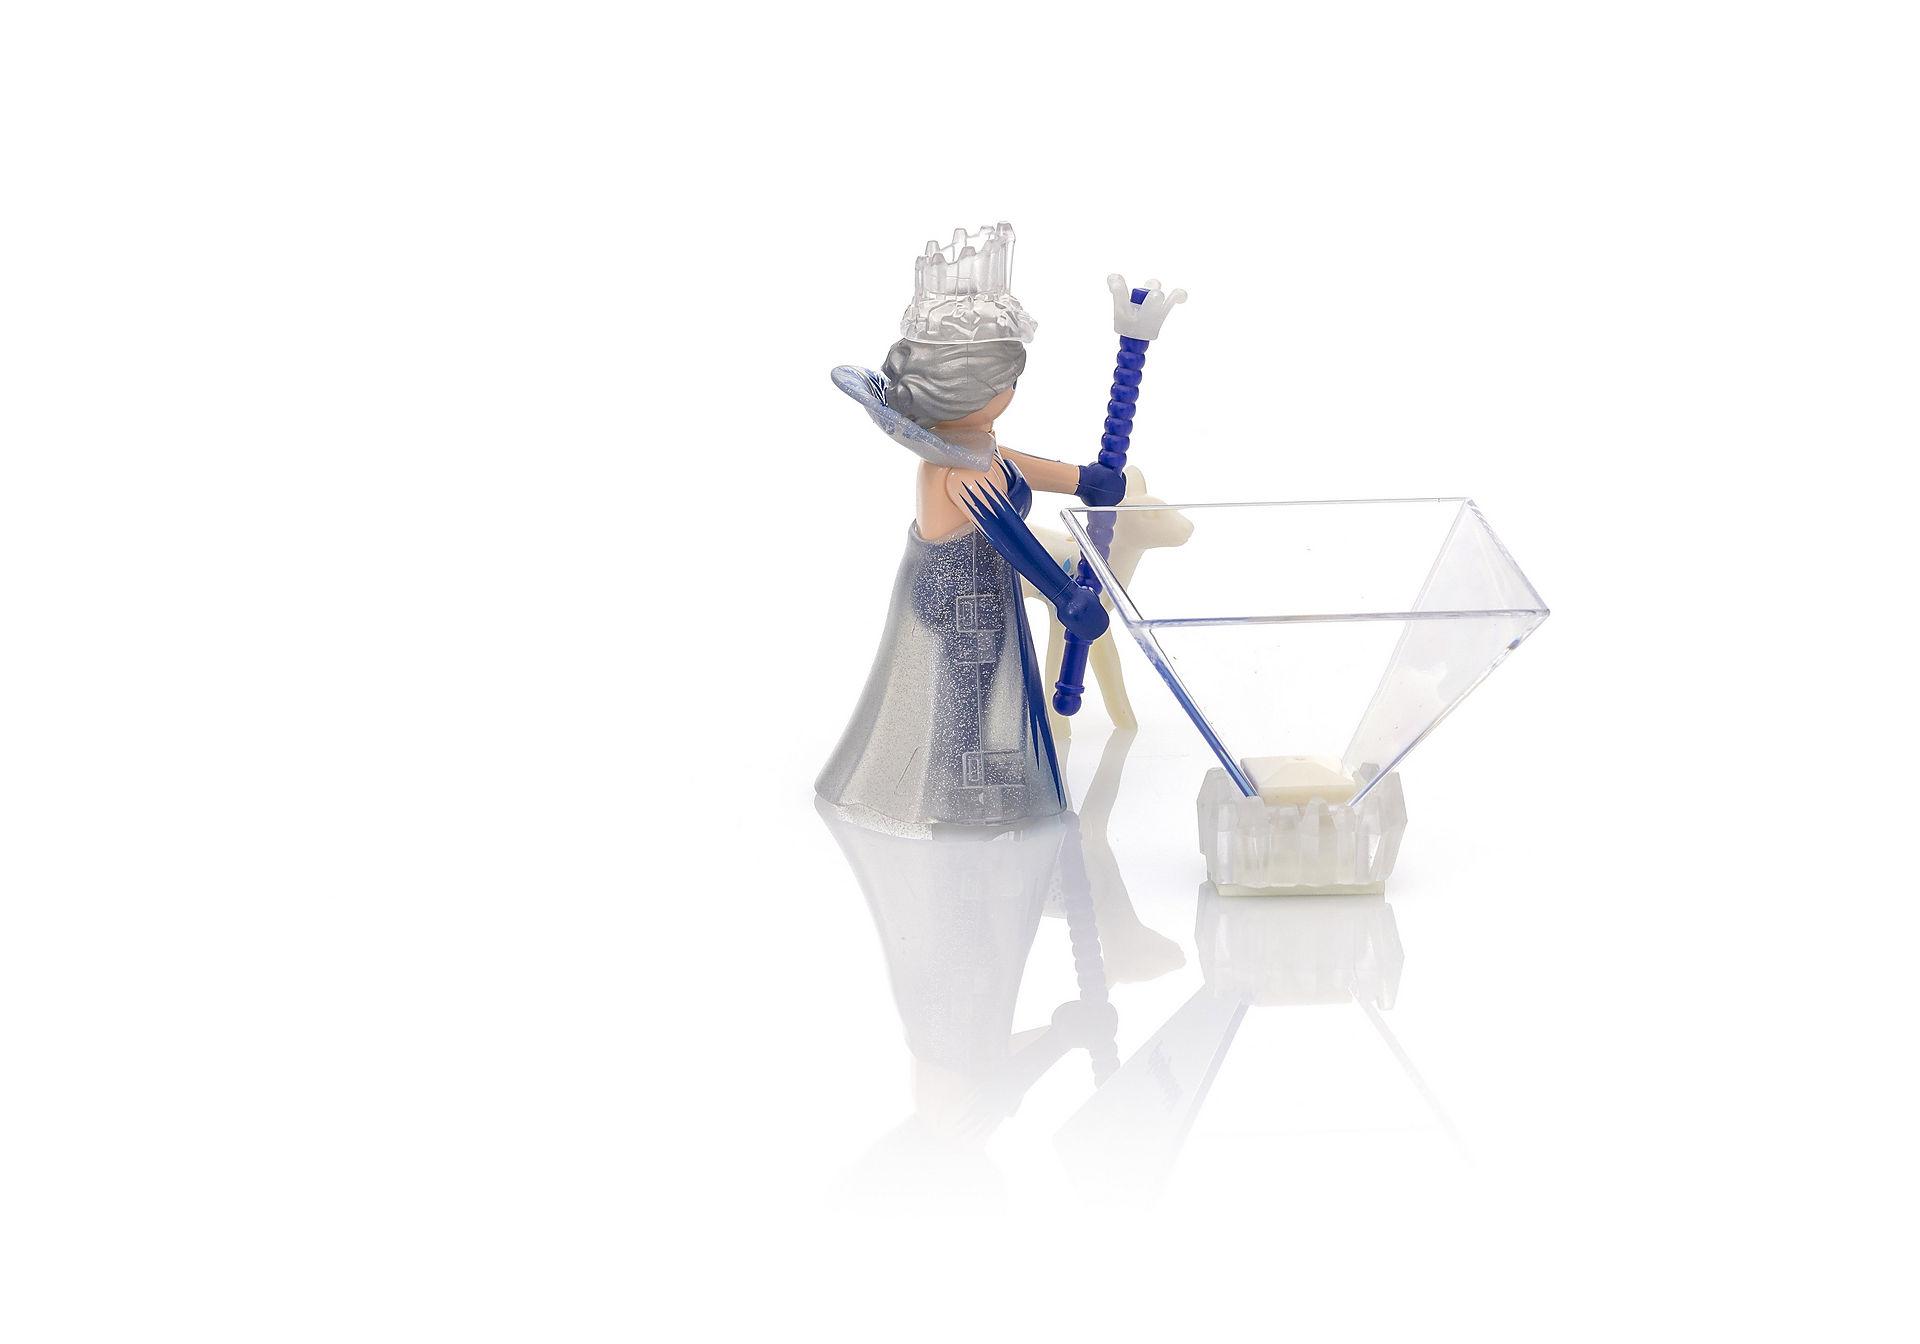 360degree image 27